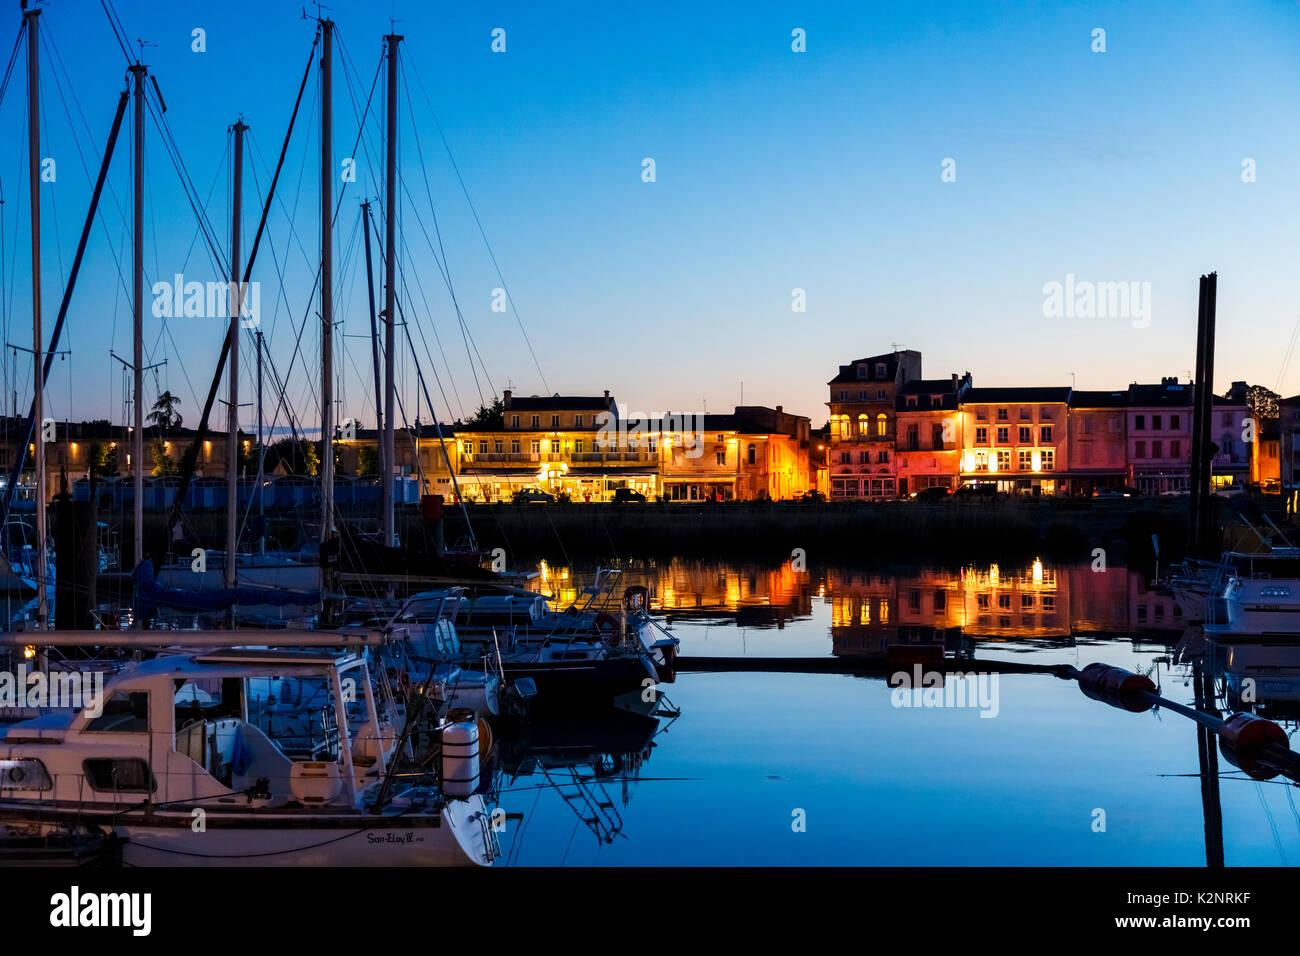 Pauillac marina at night, yachts, reflections and illuminated buildings, Gironde Estuary, Gironde department in Stock Photo